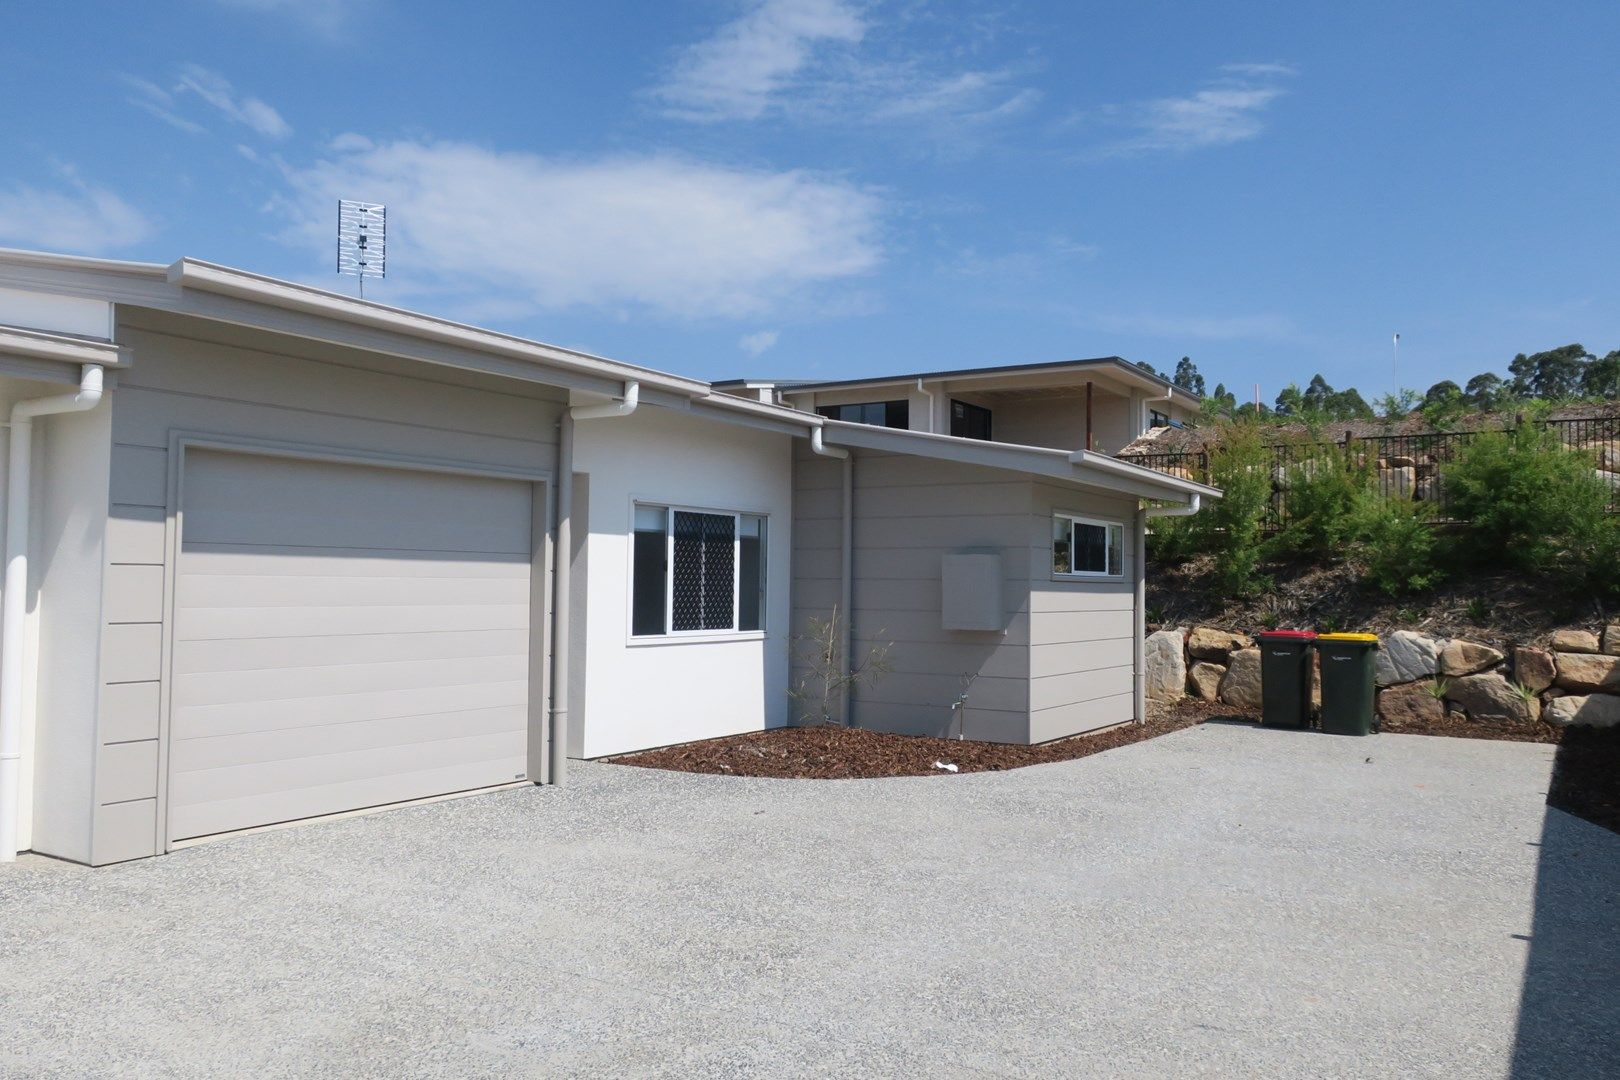 2/40 Davey Drive, Woombye QLD 4559, Image 0